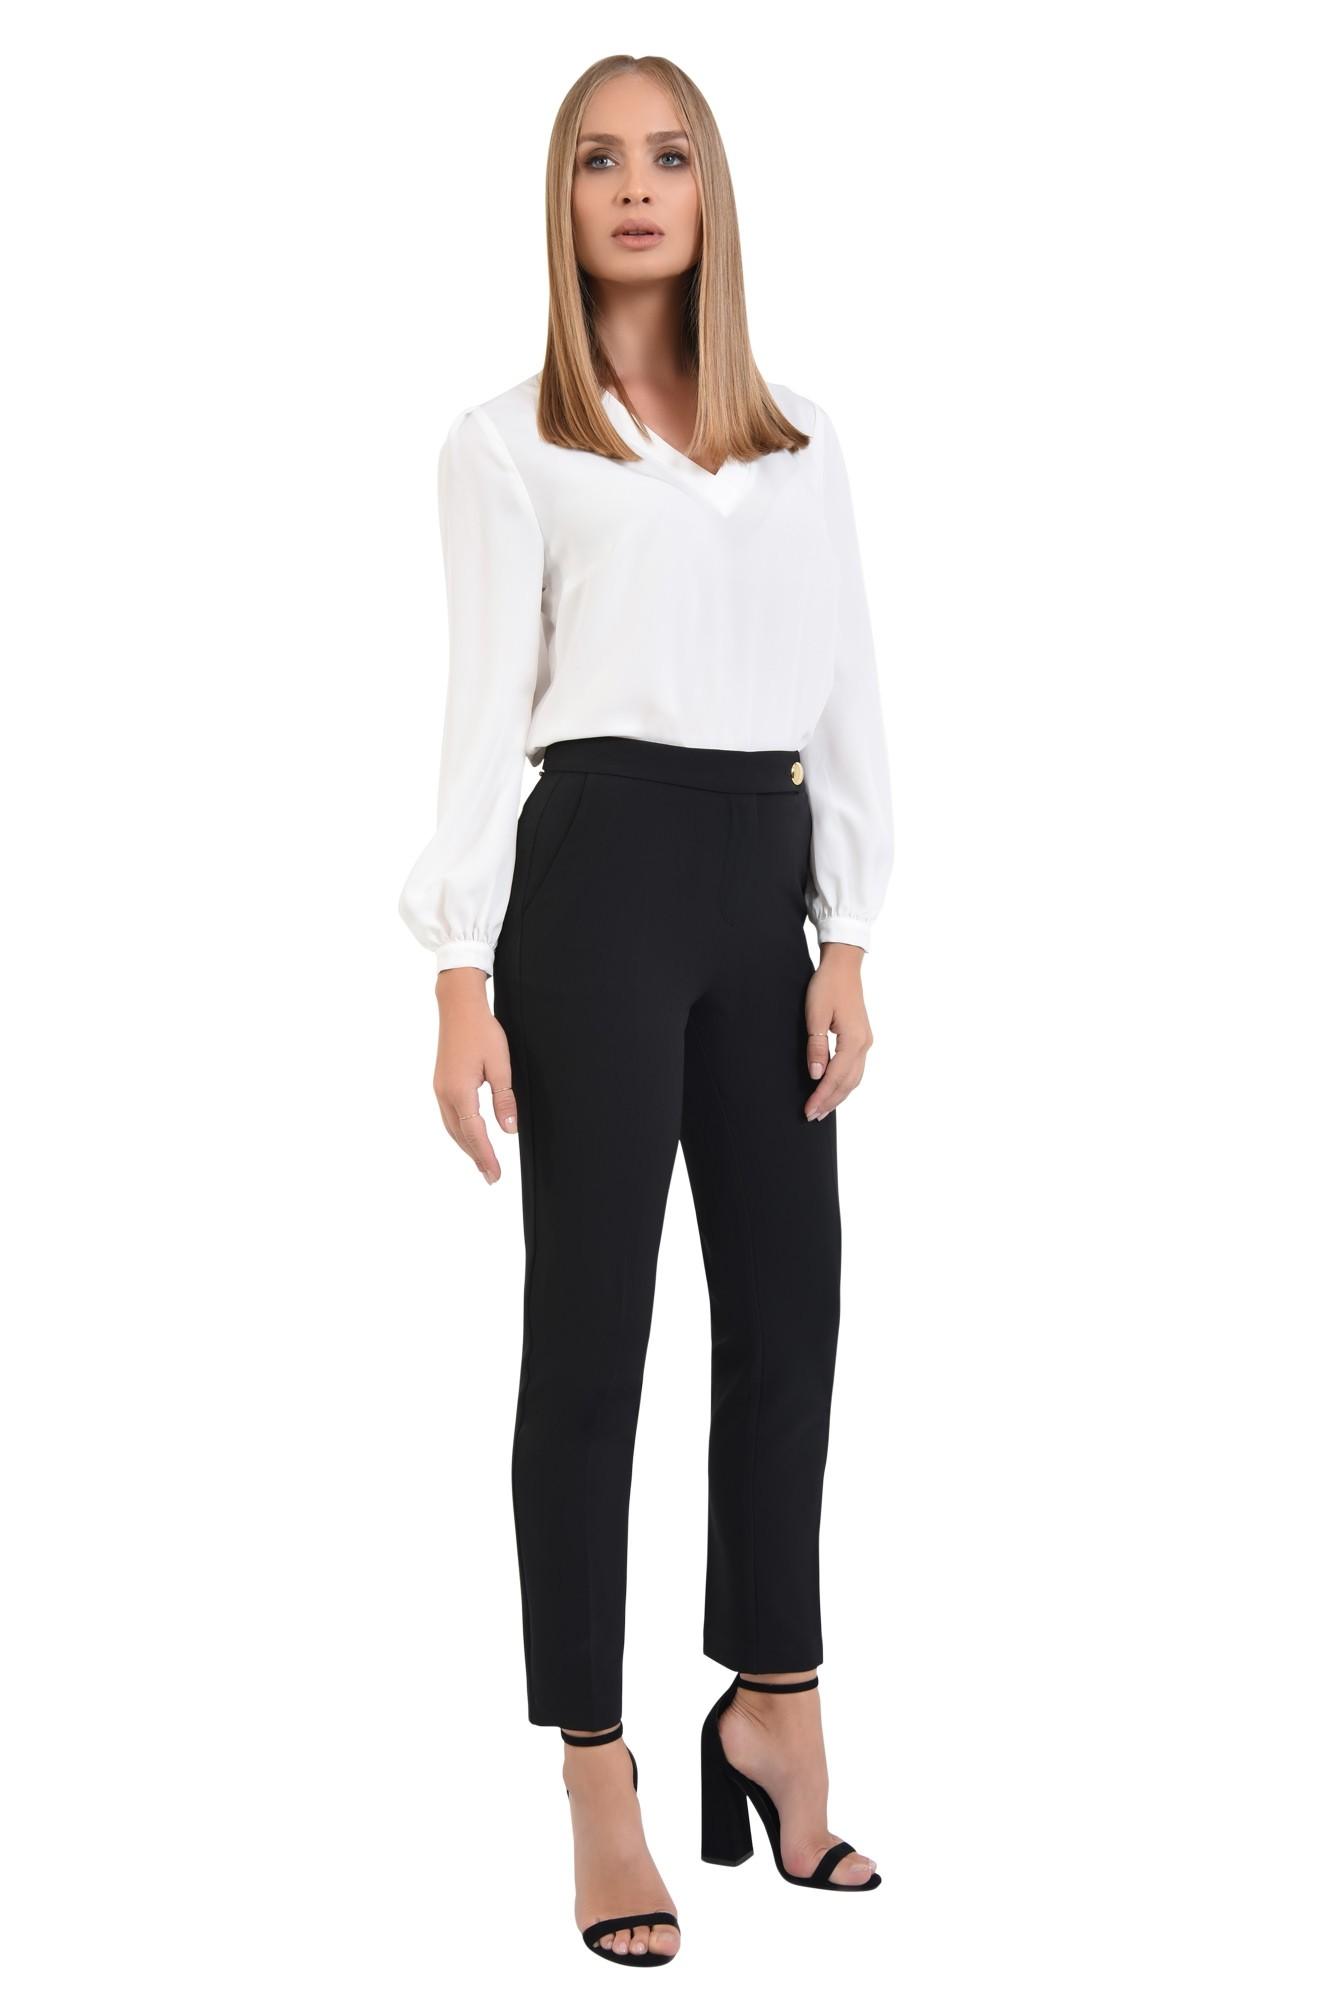 0 - pantaloni casual, croi conic, negru, nasture auriu